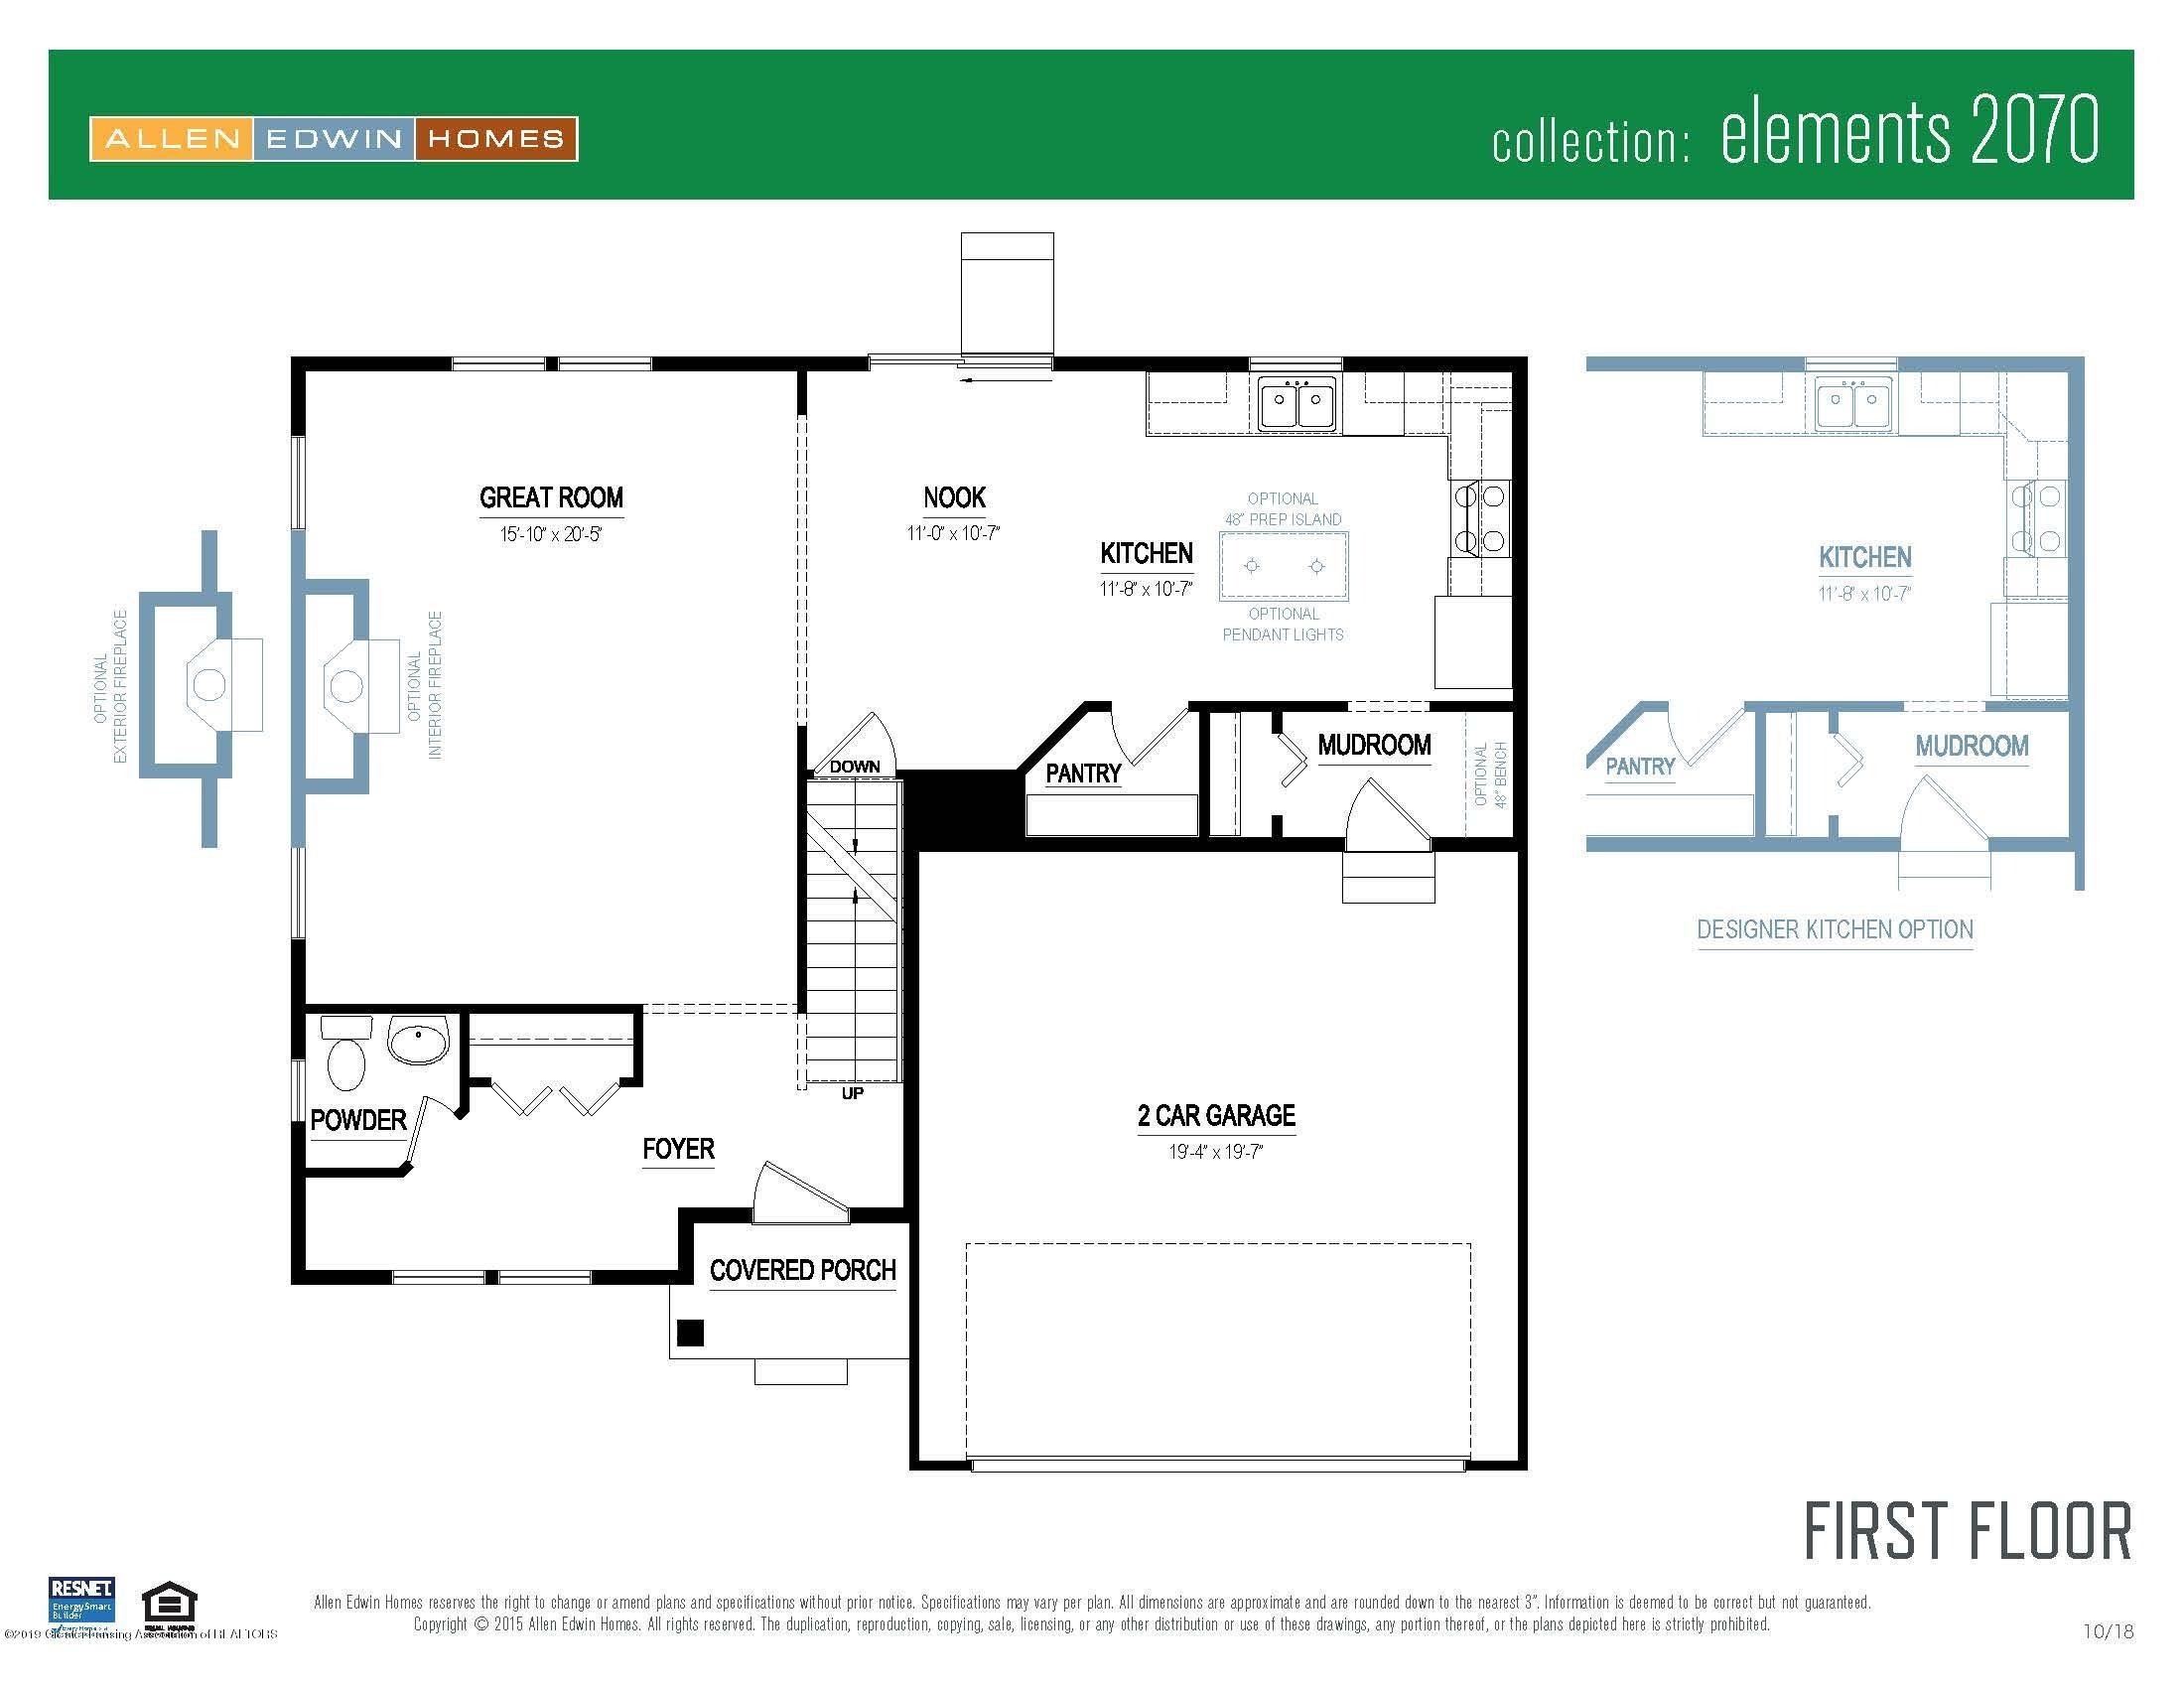 1136 River Oaks Dr - Elements 2070 V8.0a First Floor - 19